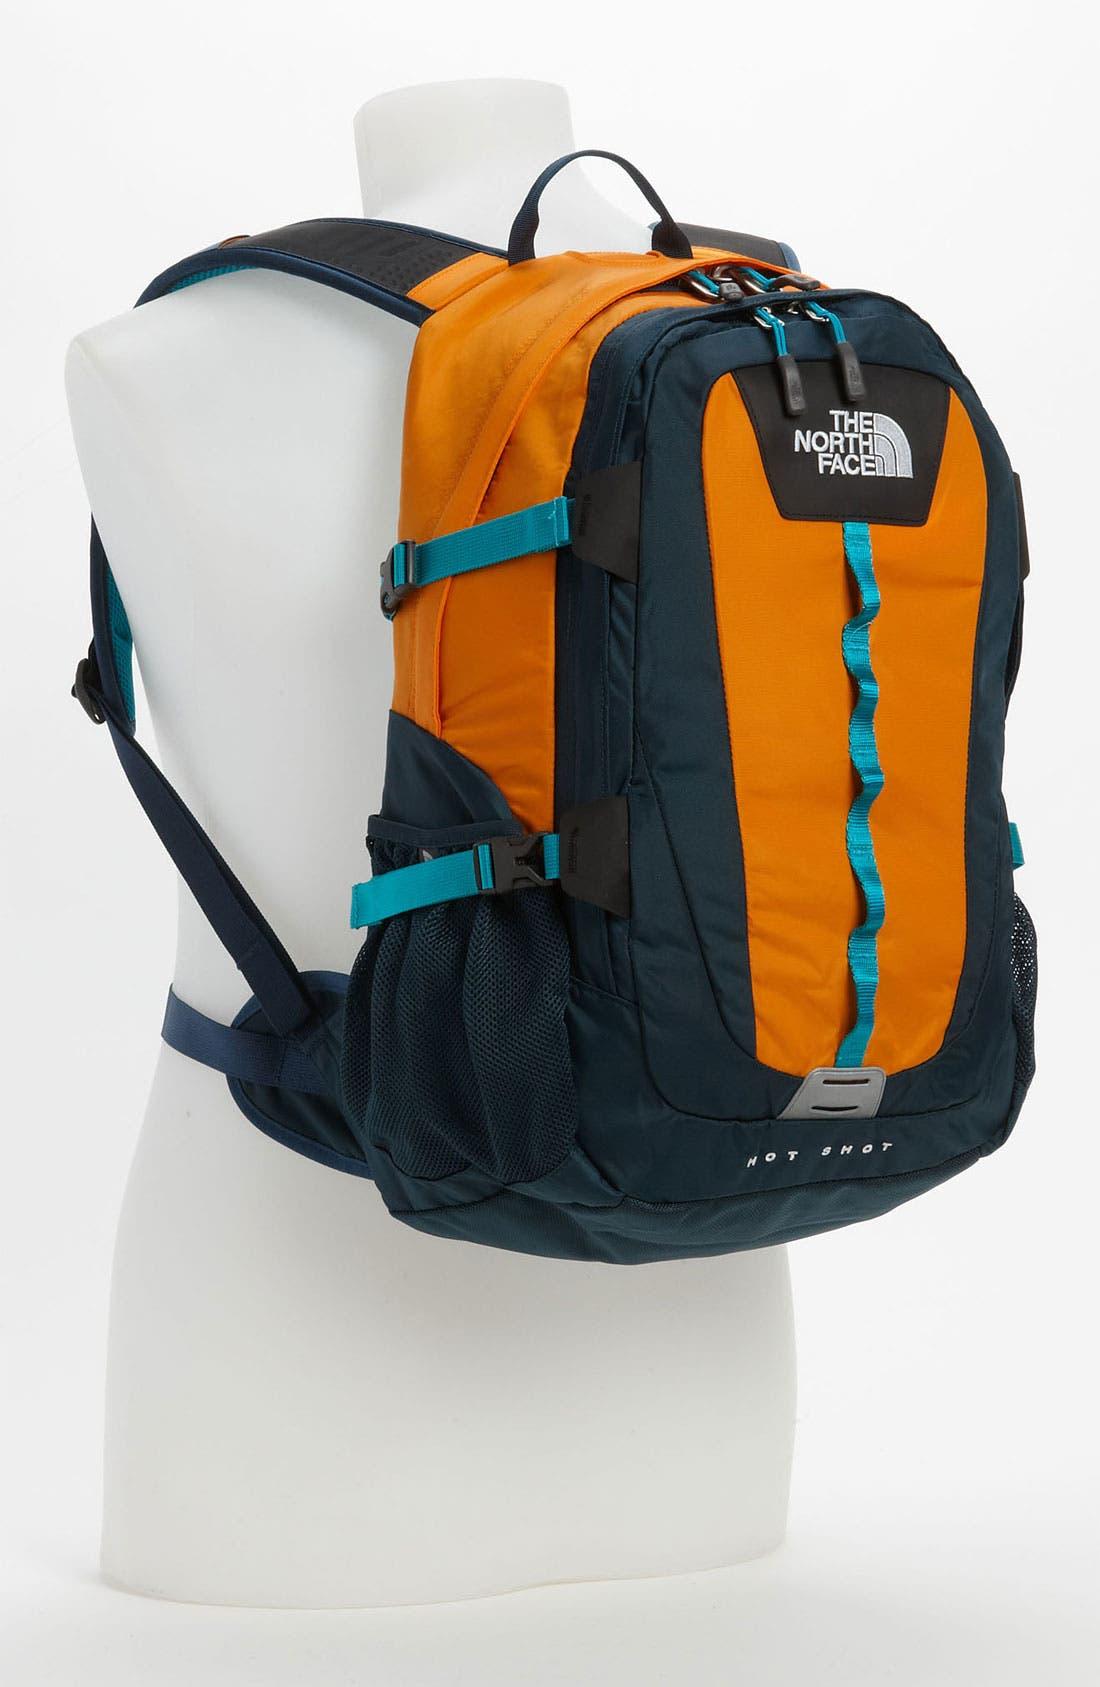 Alternate Image 4  - The North Face 'Hot Shot' Backpack